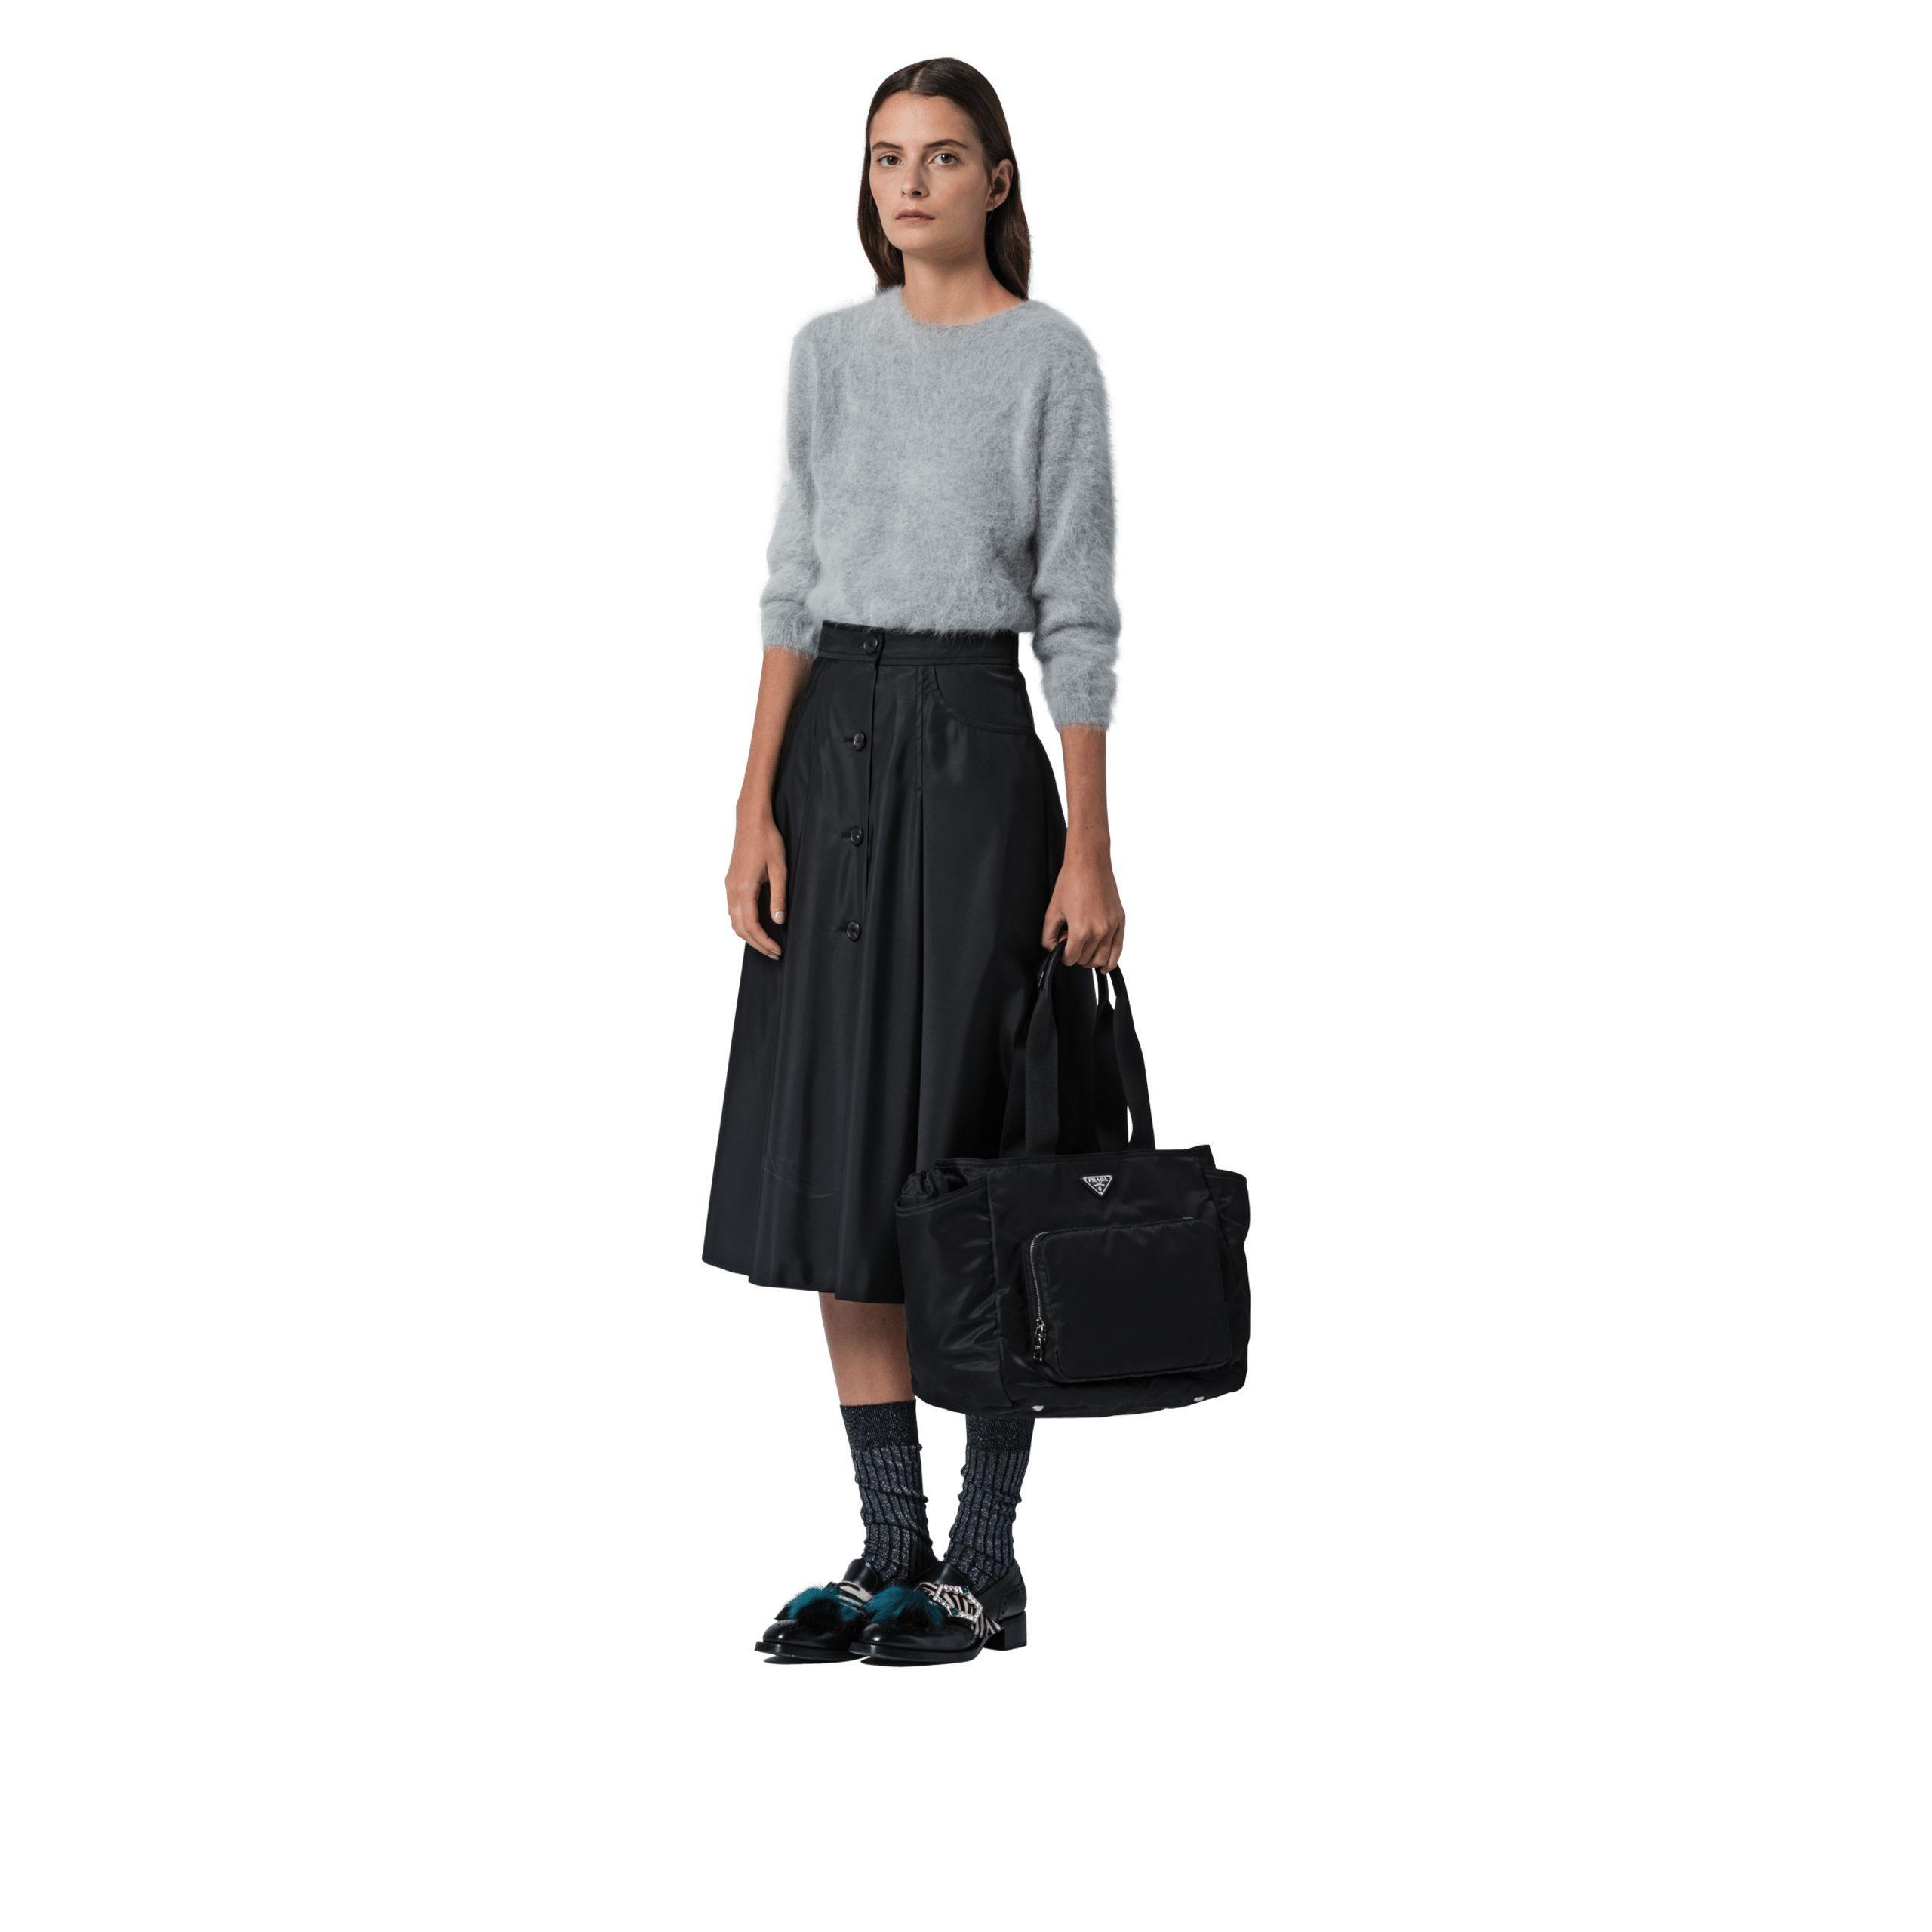 d2e4d2734f14 Lyst - Prada Fabric Baby Bag in Black